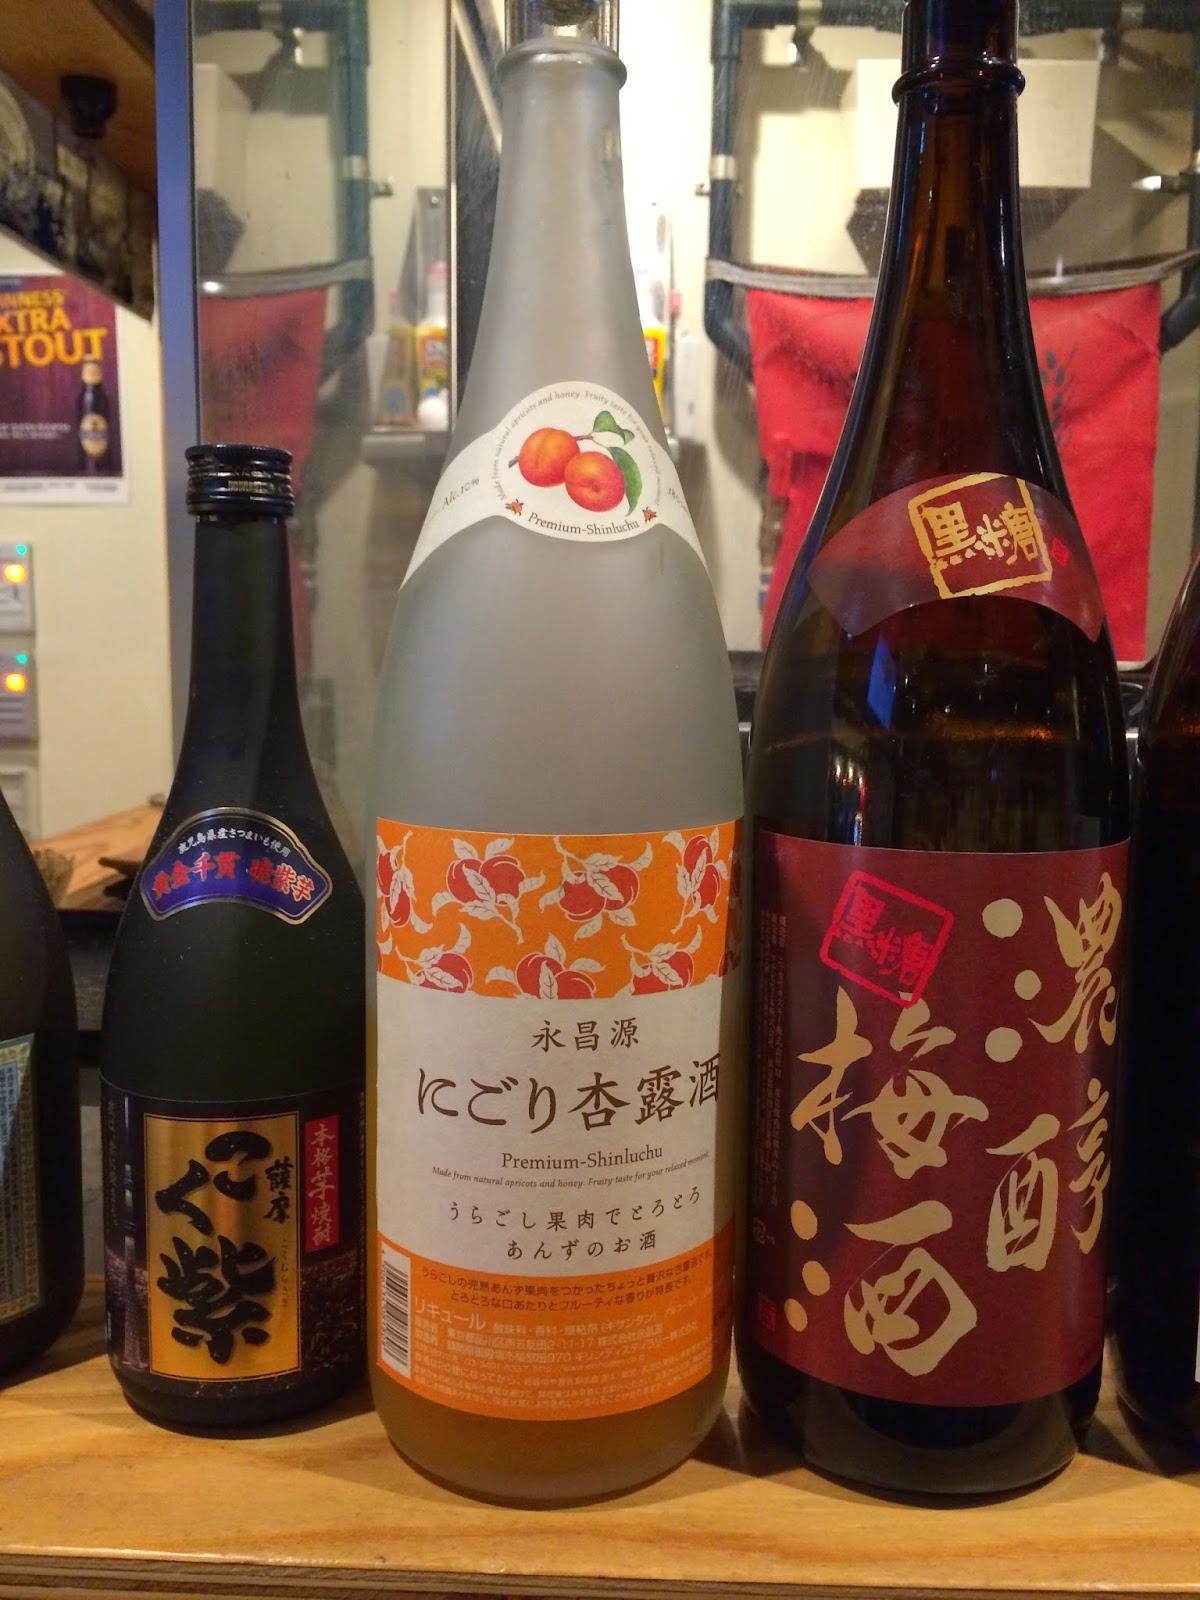 japan Japanese food tokyo izakaya sake shochu wine